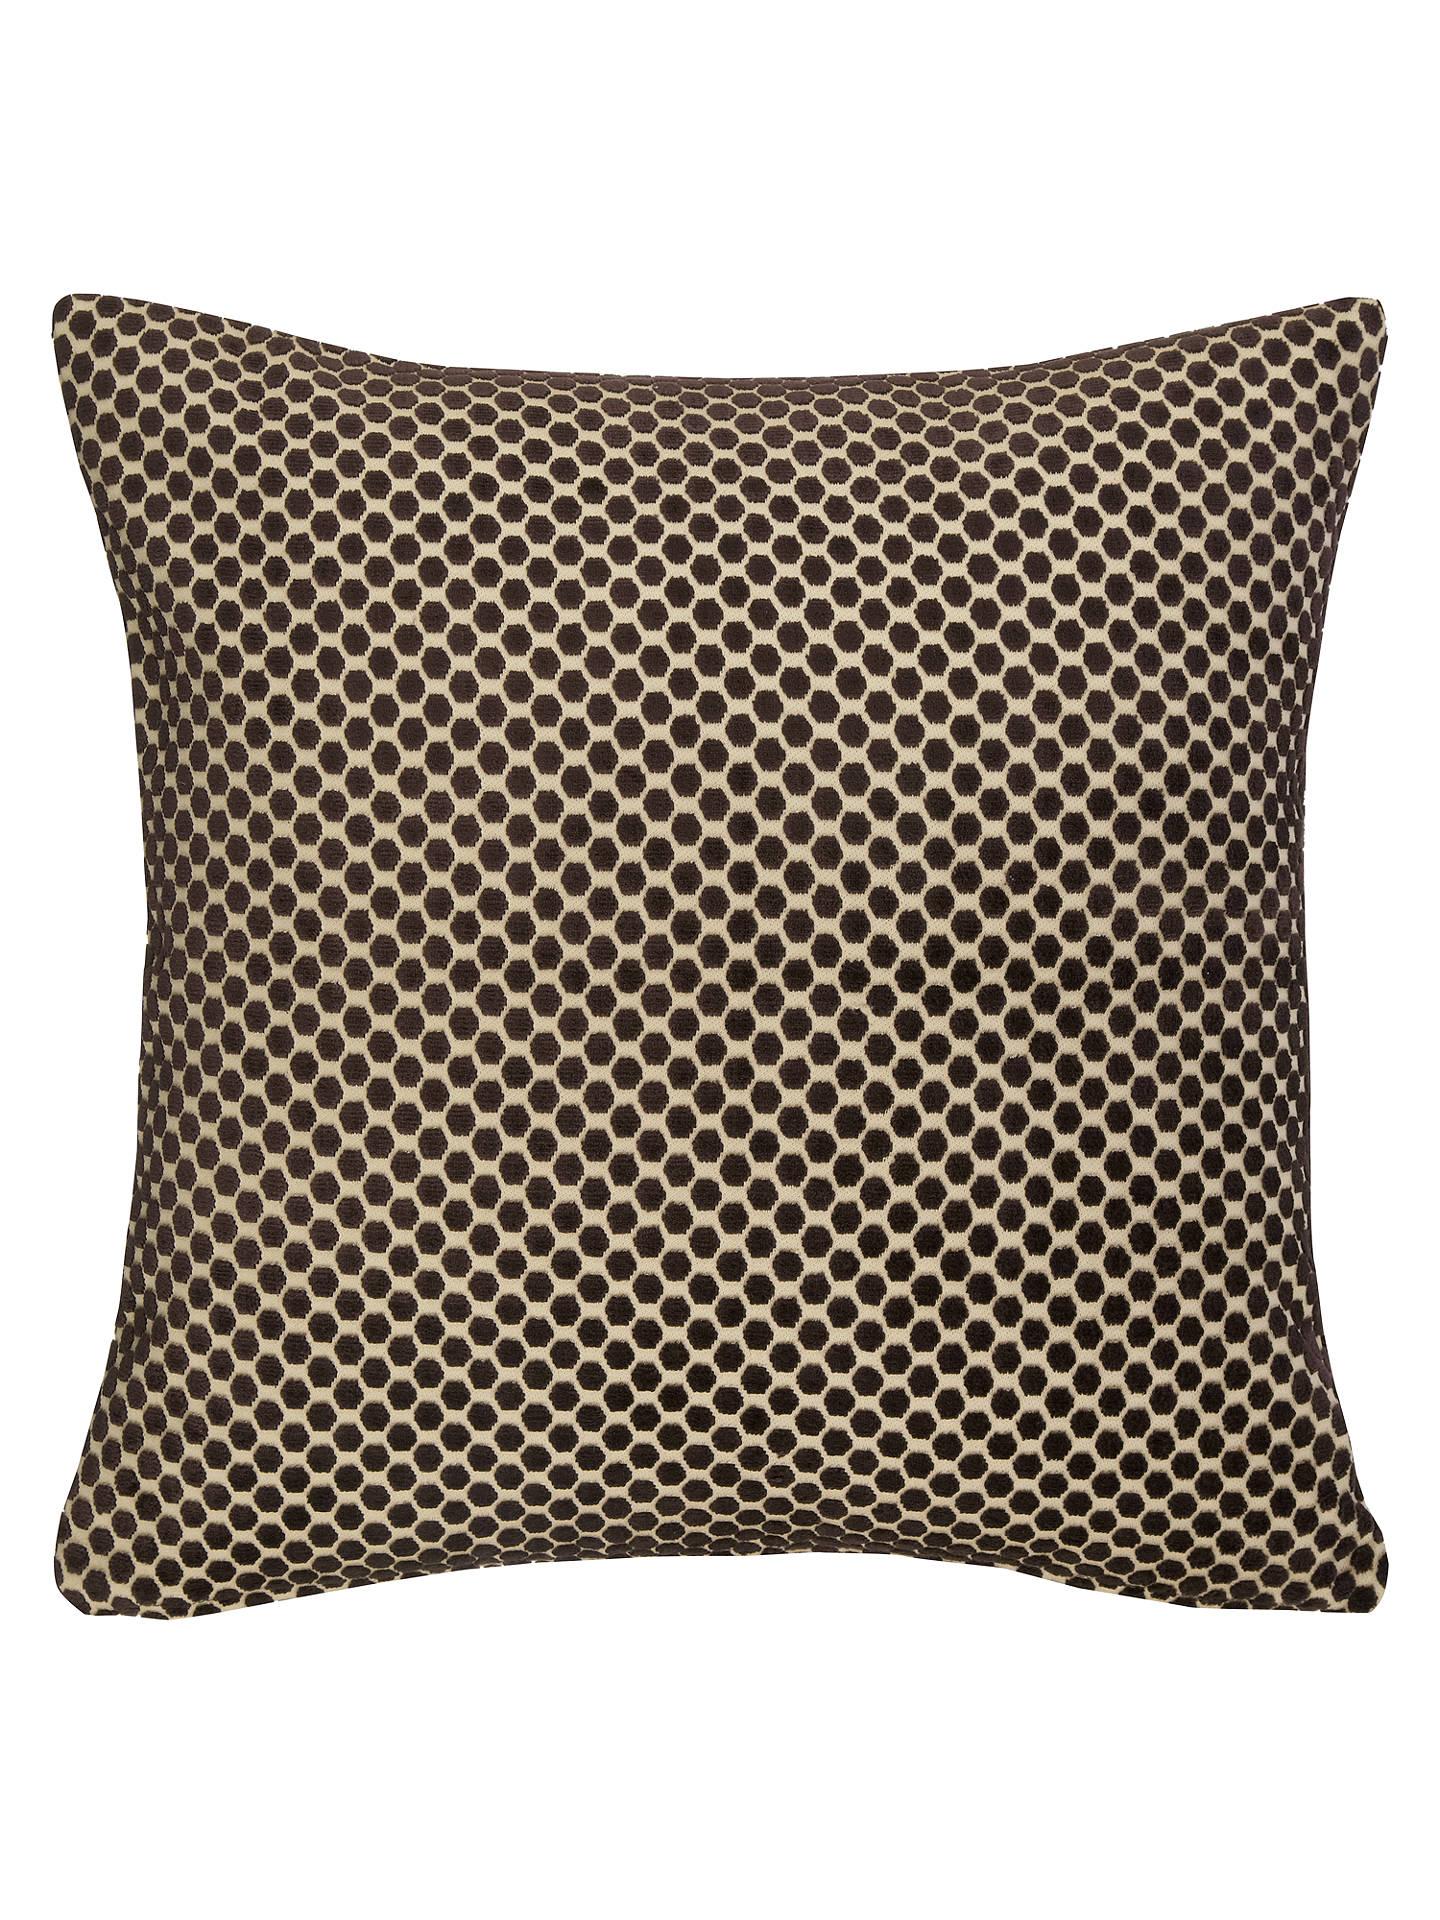 john lewis mini spot cushion at john lewis partners. Black Bedroom Furniture Sets. Home Design Ideas